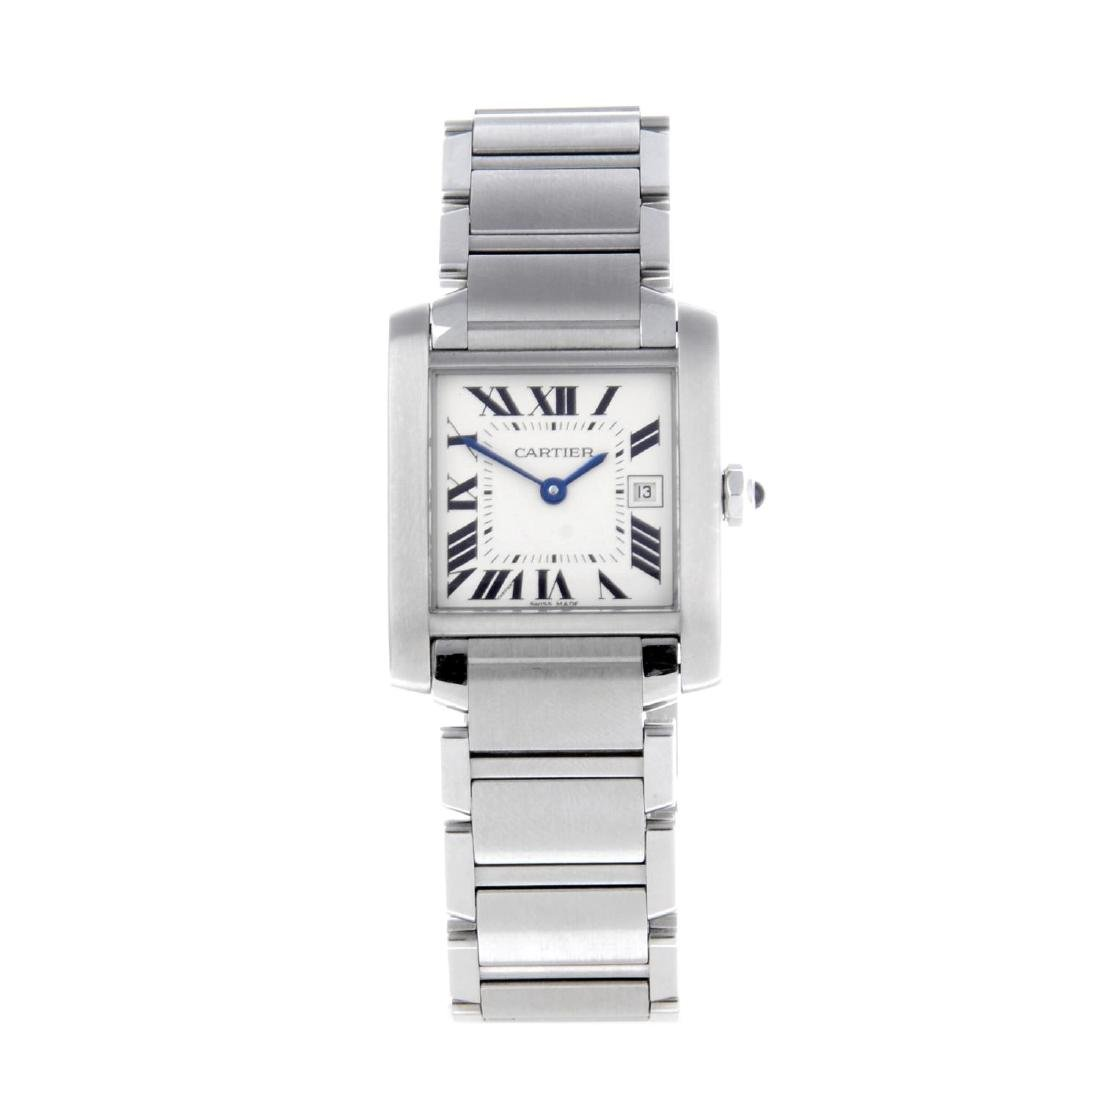 CARTIER - a Tank Francaise bracelet watch. Stainless